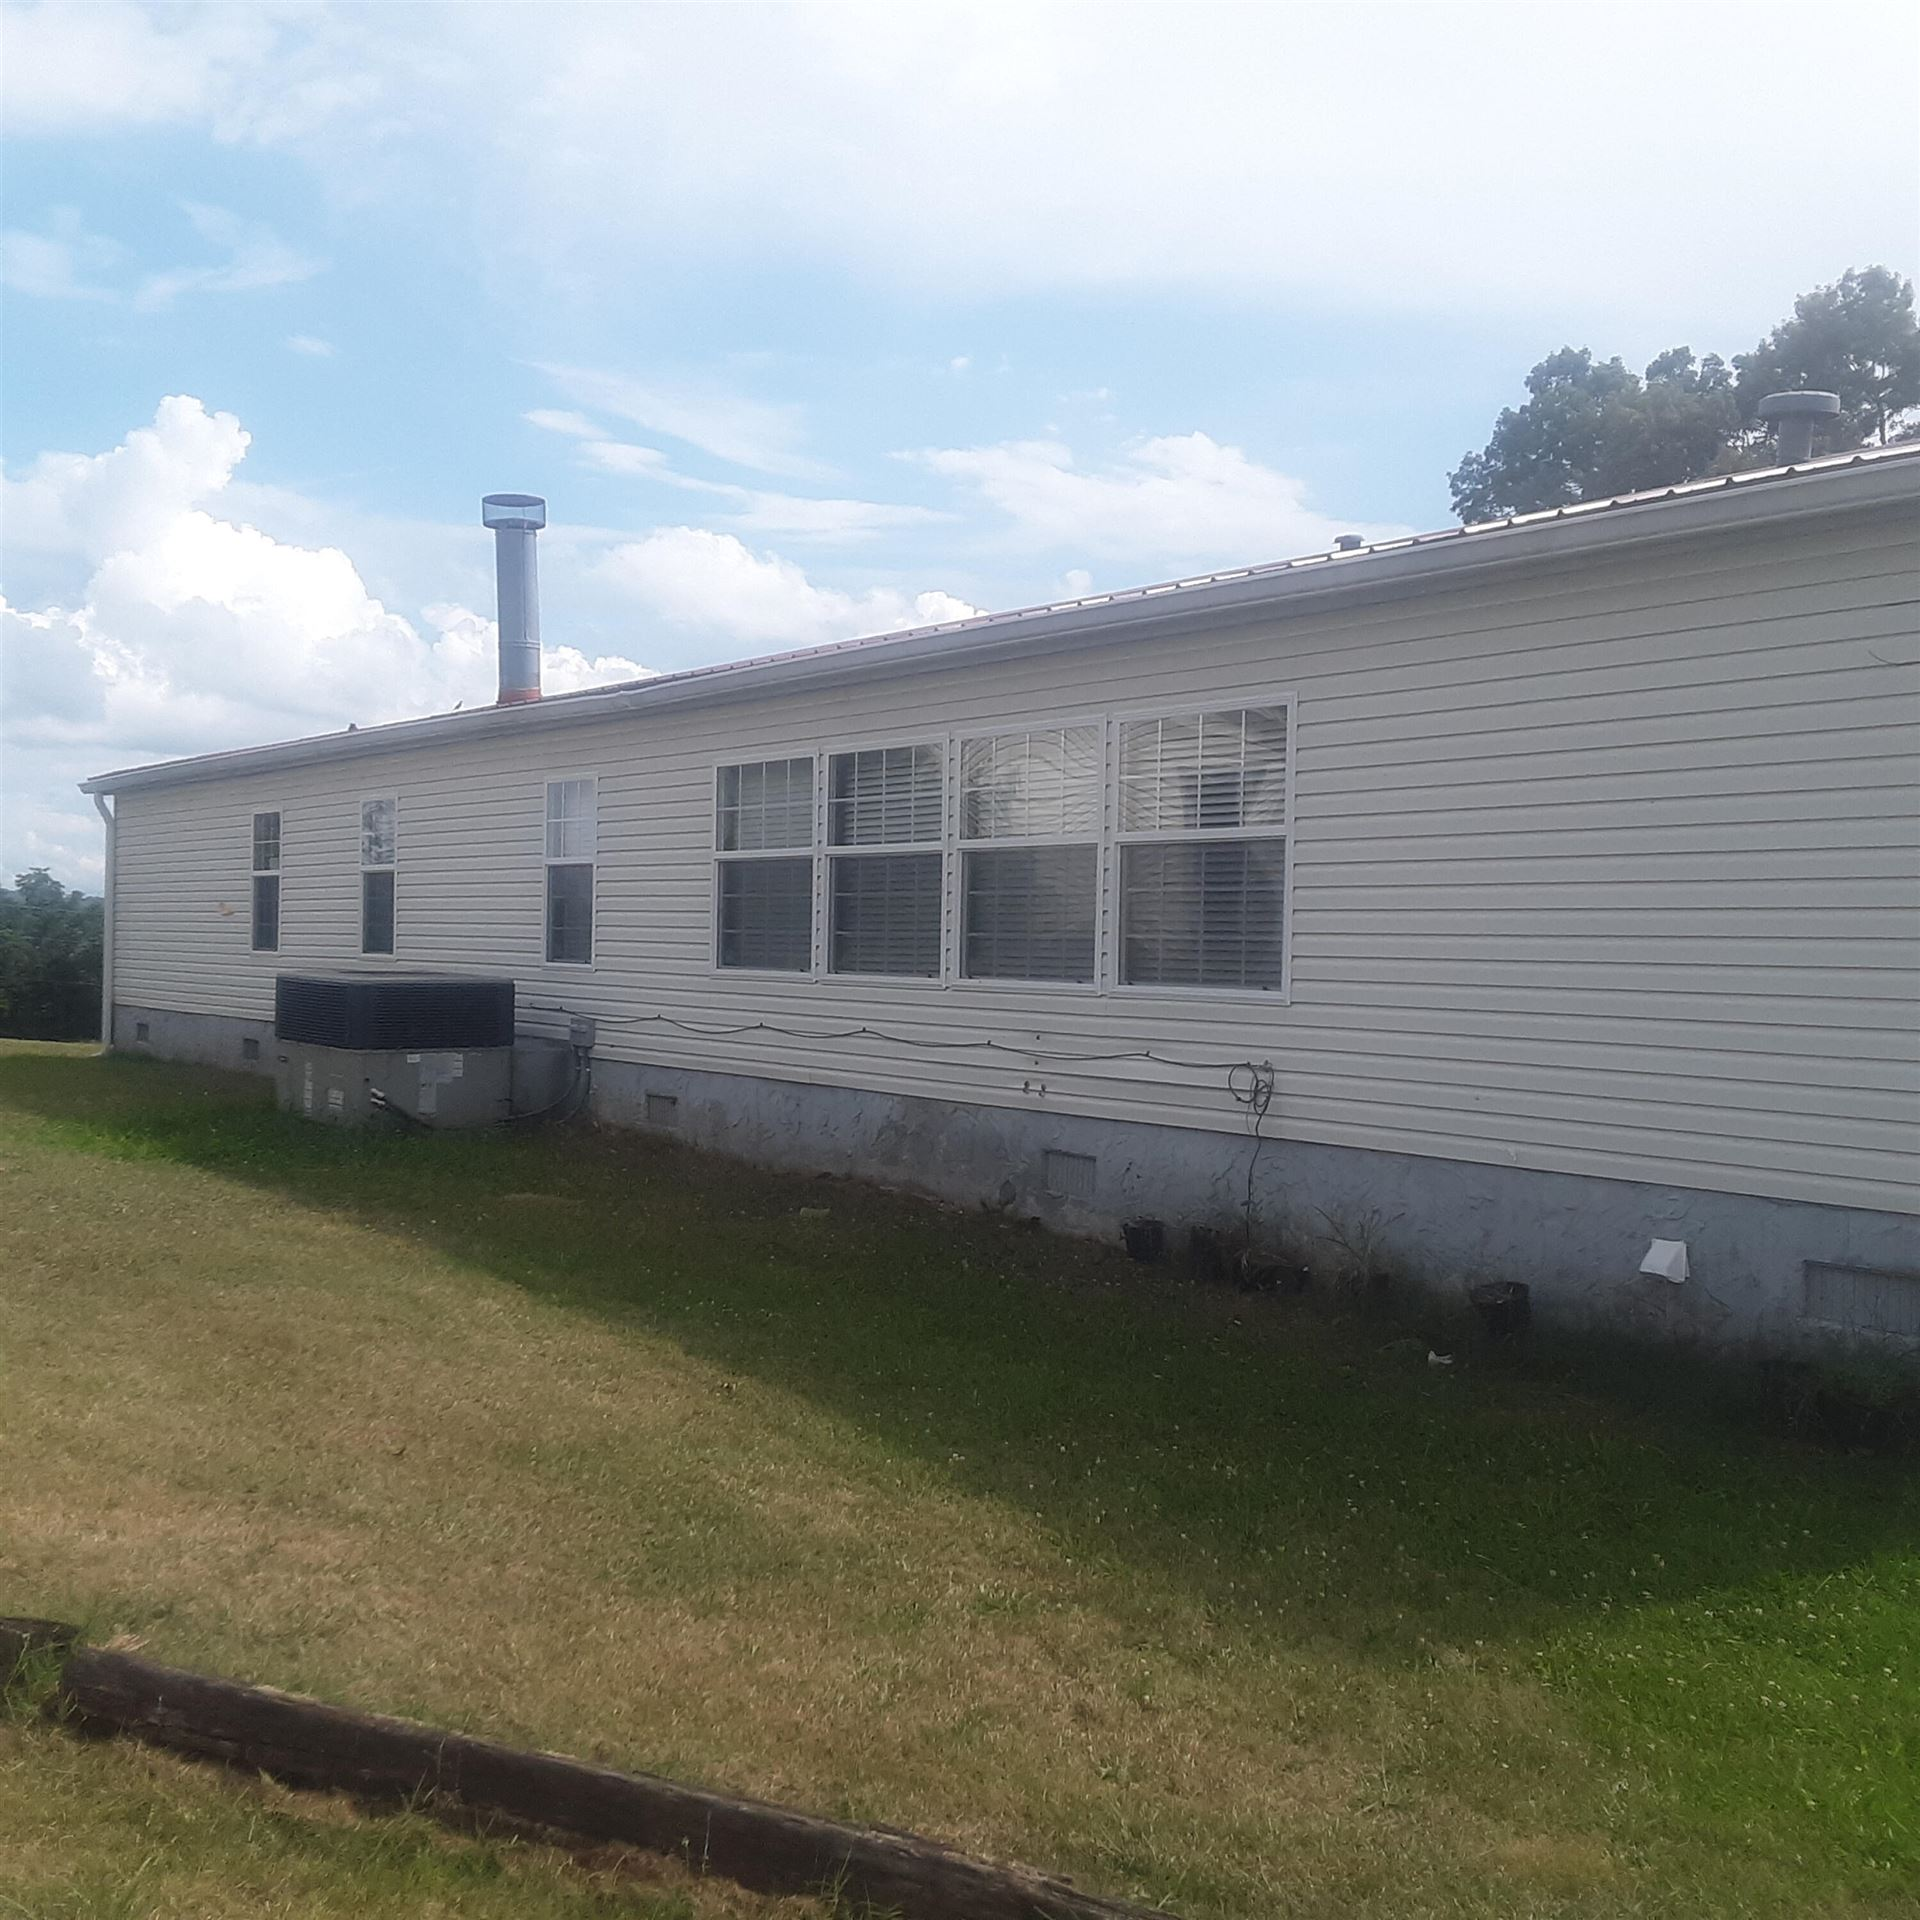 841 Howell River Rd, Rutledge, TN 37861 - MLS#: 1159475